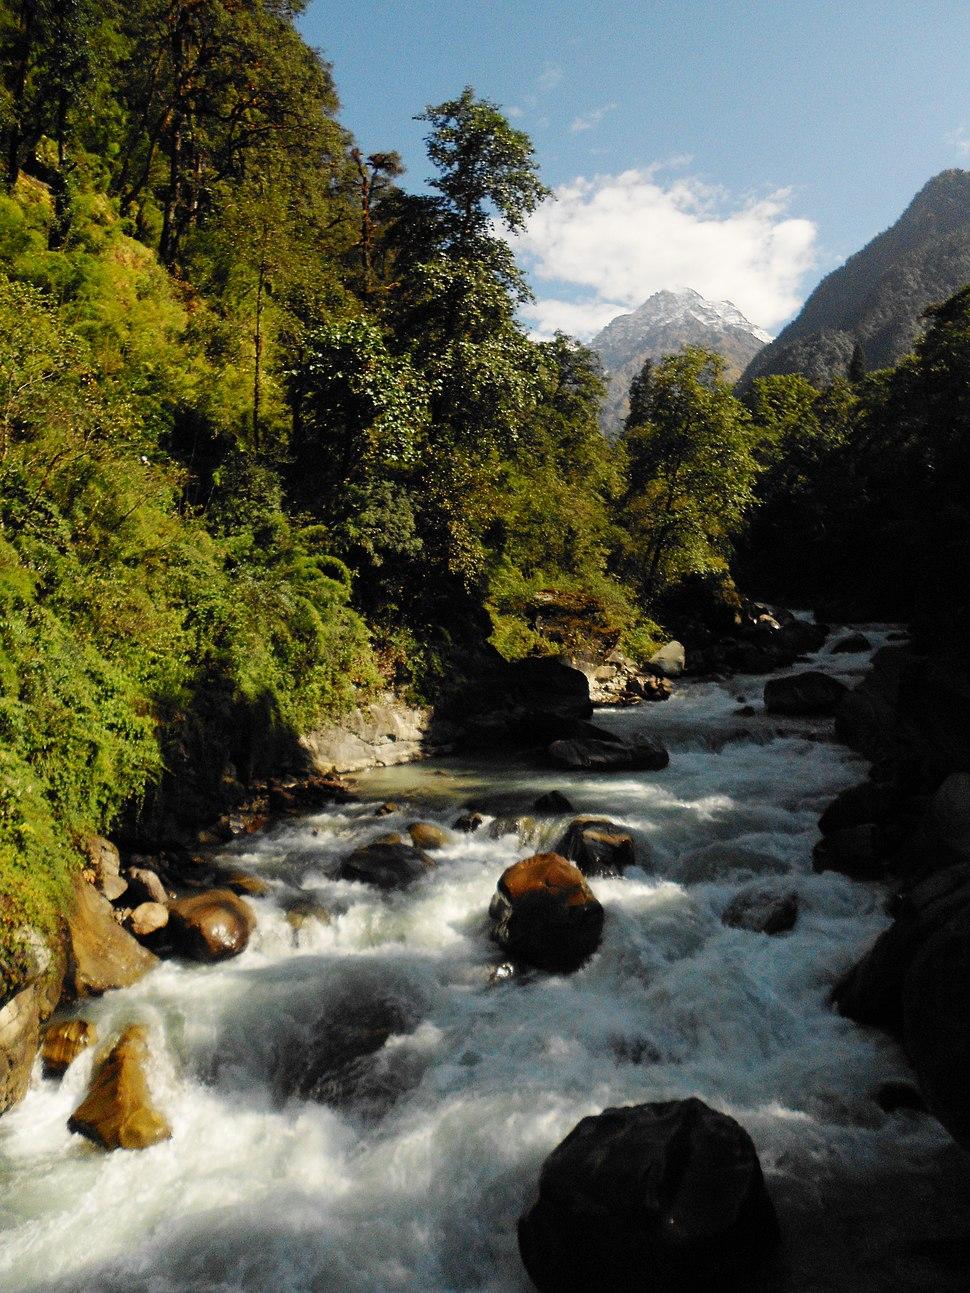 Pindari river from Dwali, Uttarakhand, India